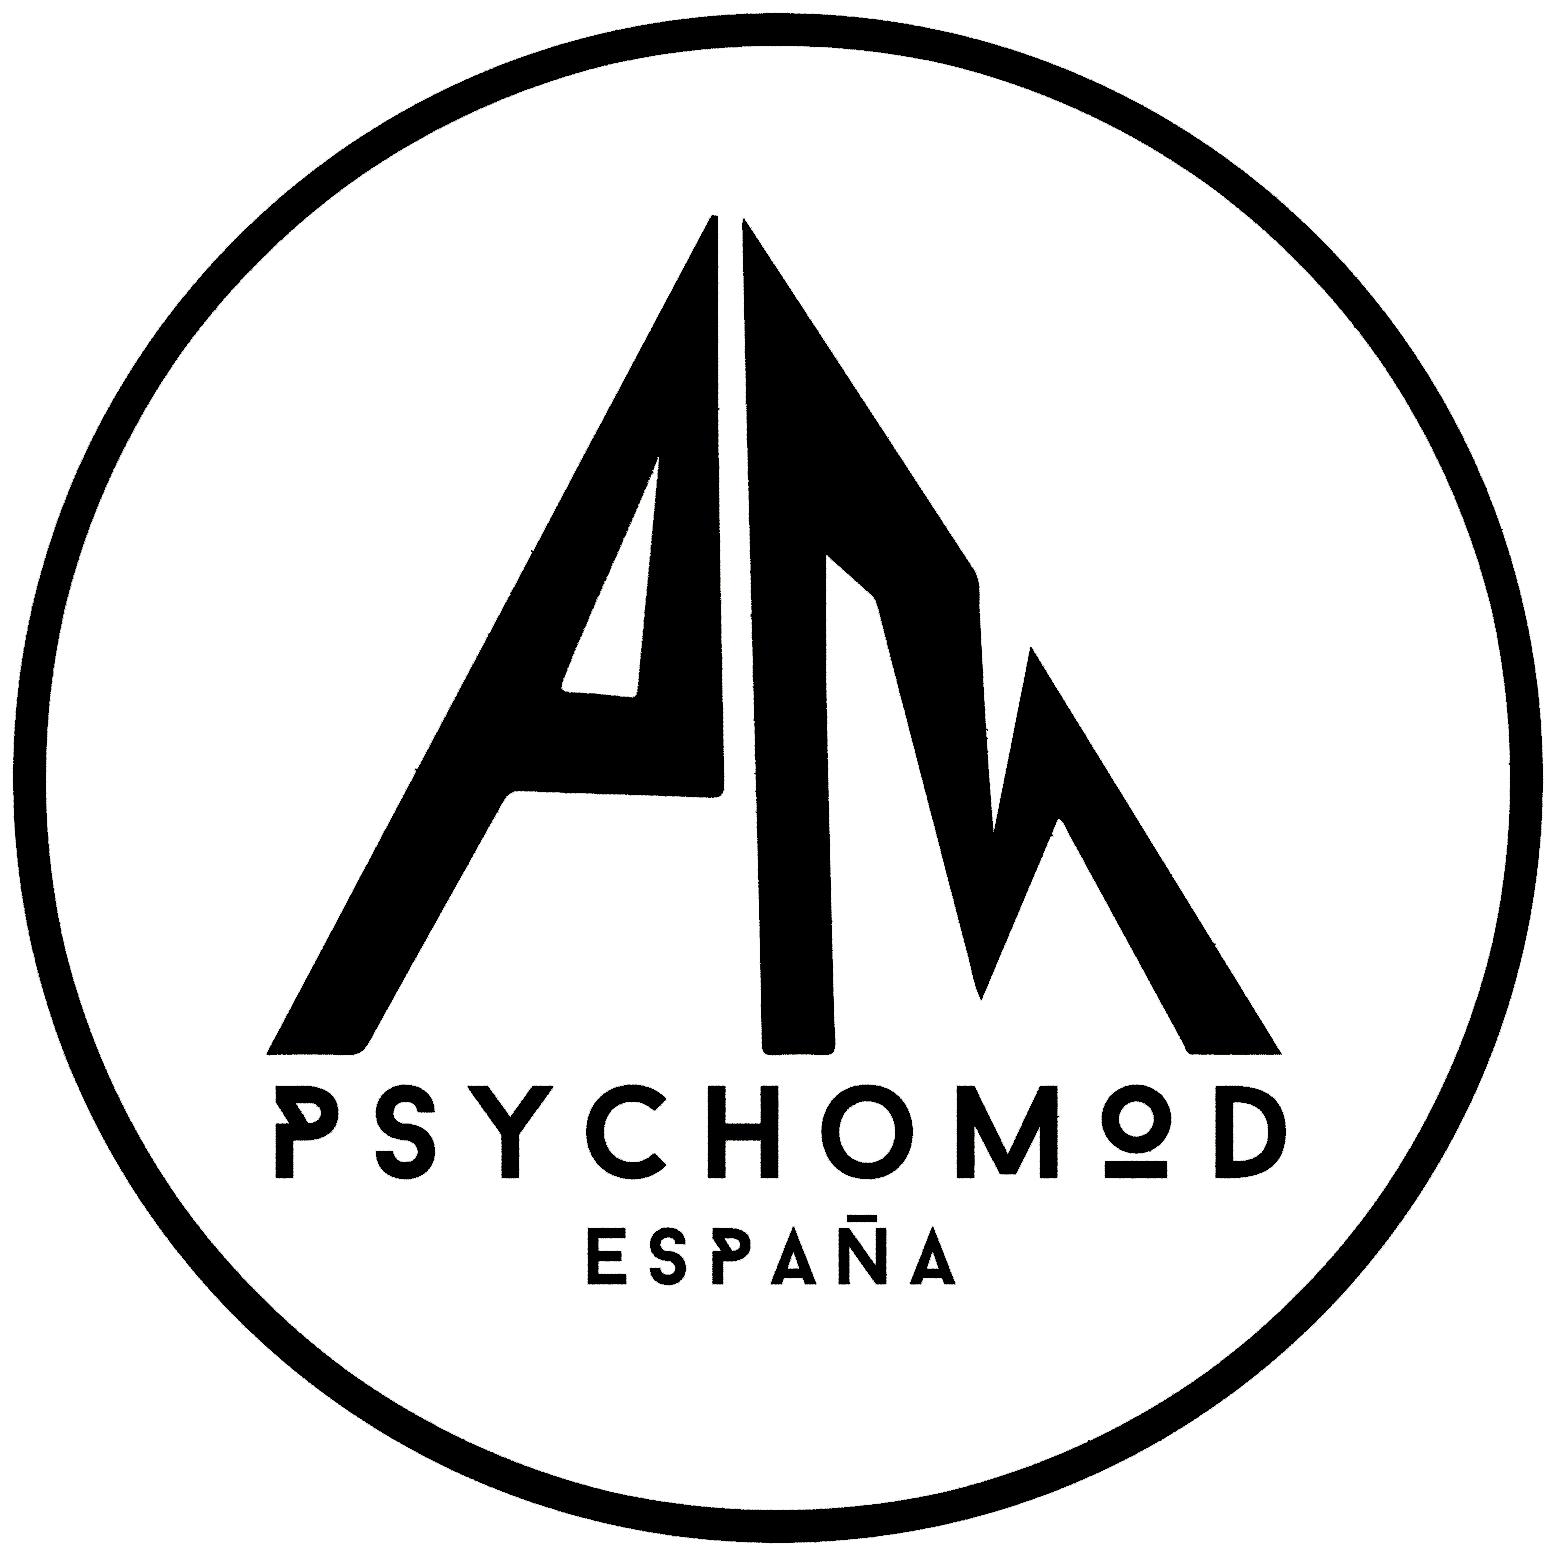 Psycho Mod España